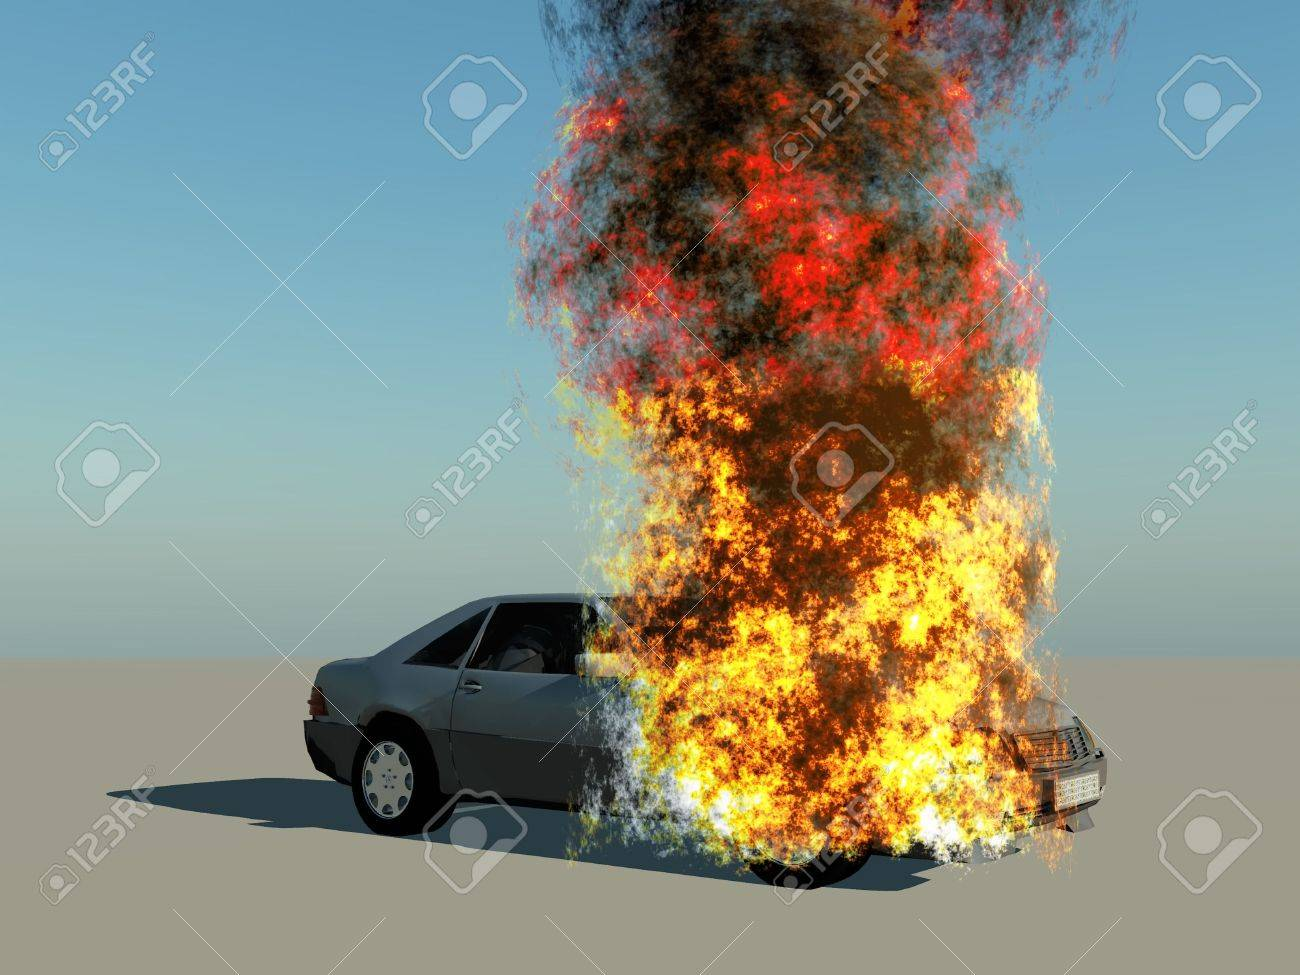 a burning car on blue background Stock Photo - 10974704